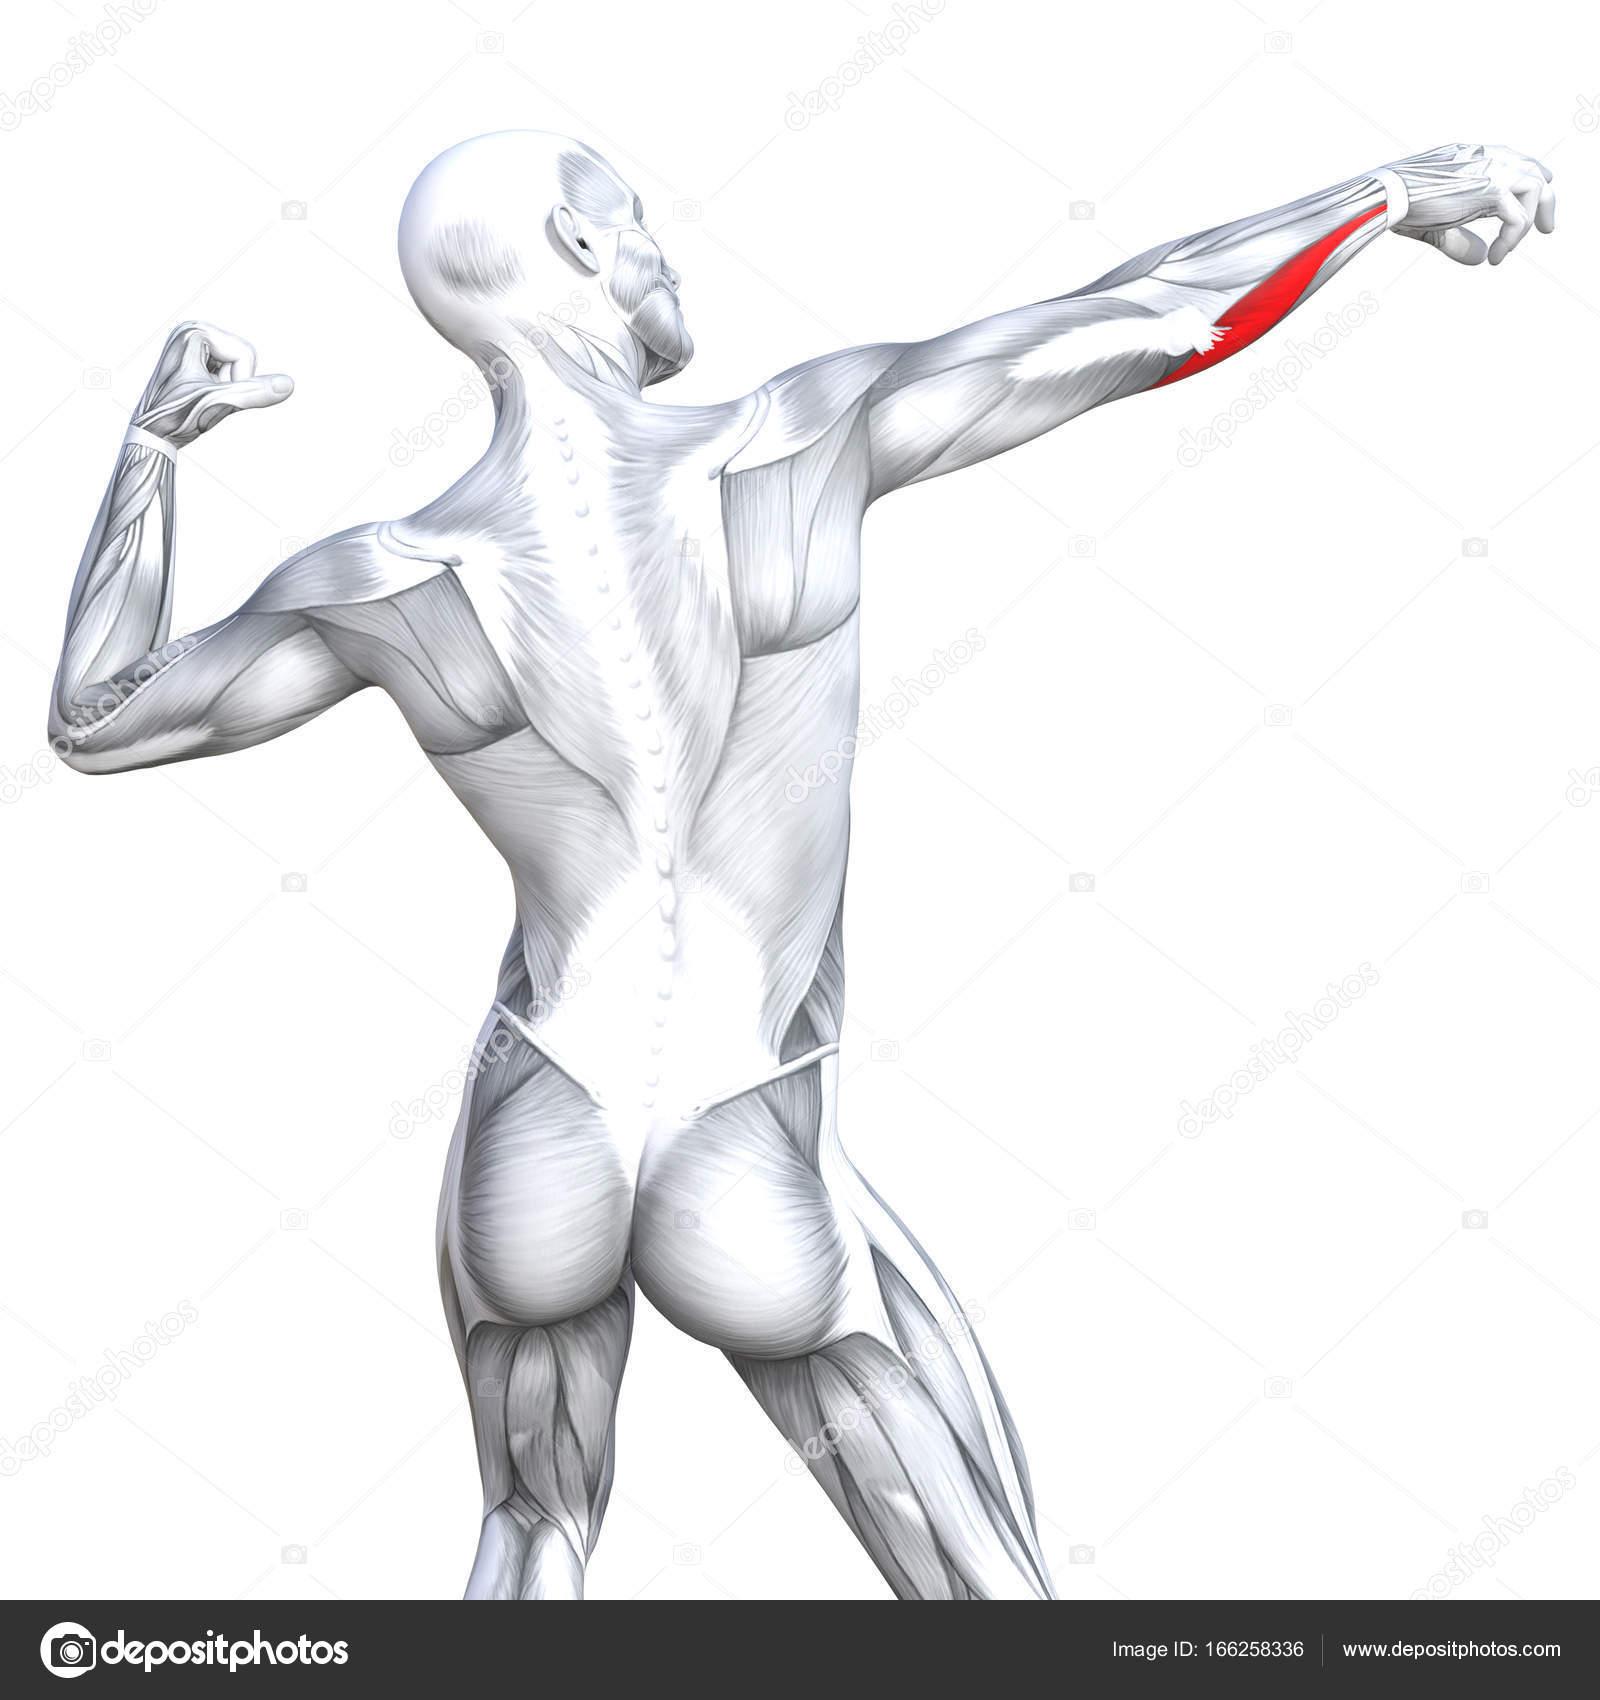 Anatomía conceptual — Foto de stock © design36 #166258336